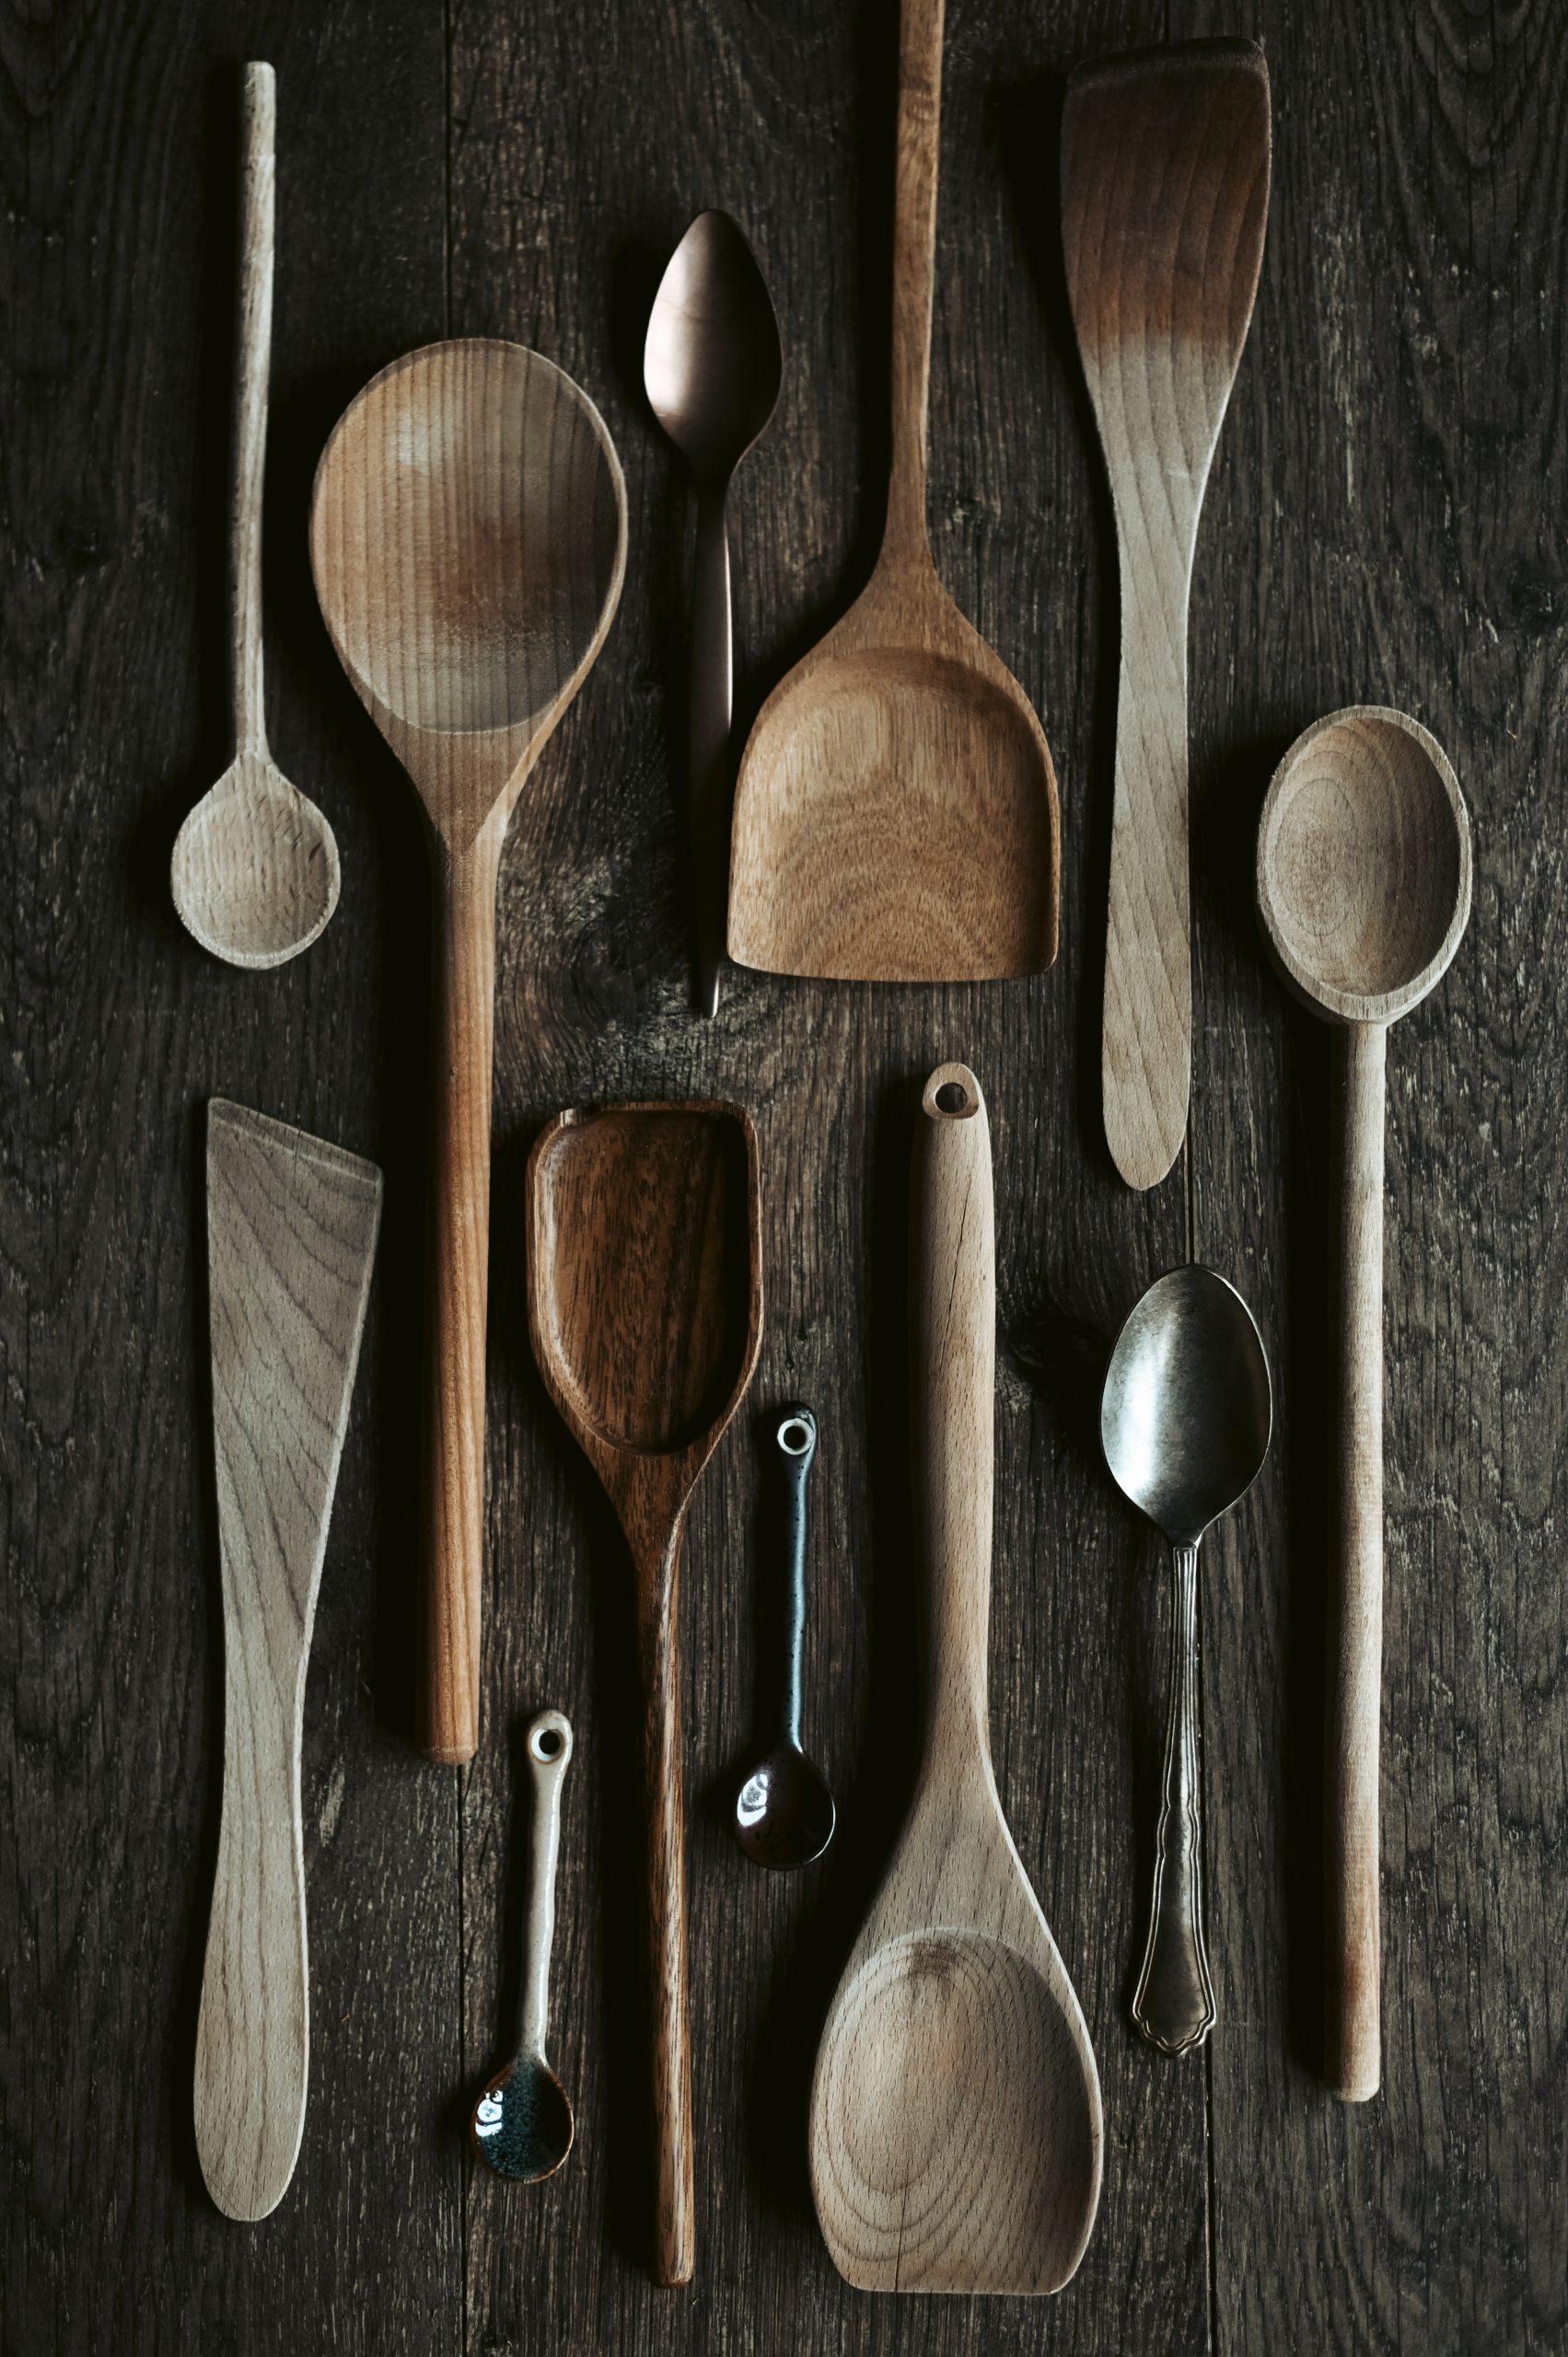 Wooden Spoon Display